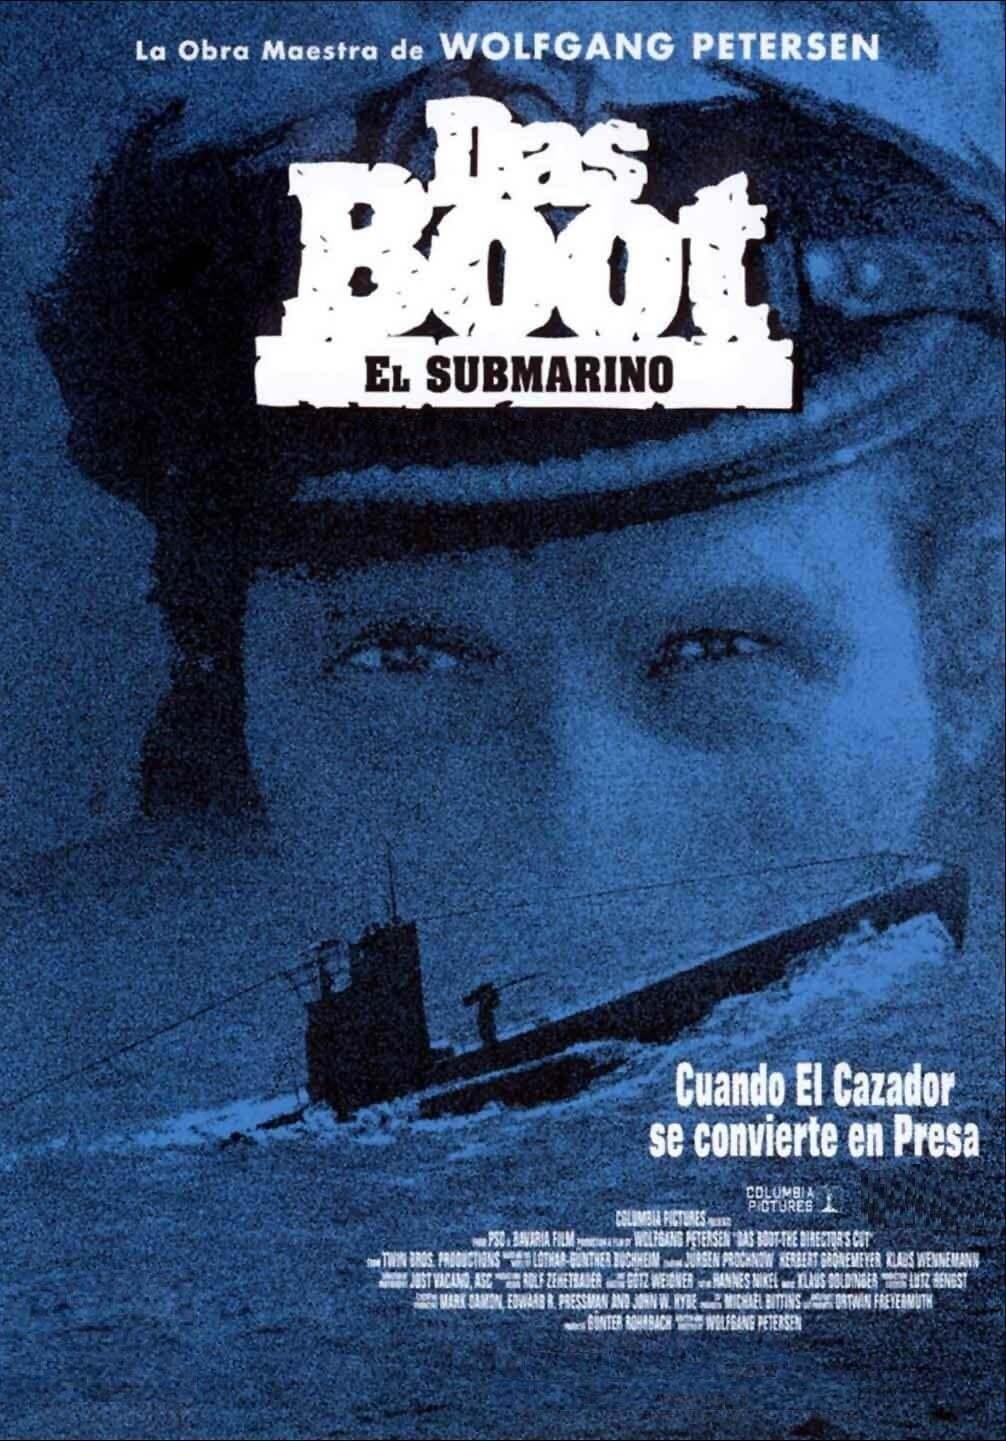 uncategorized - das boot - DAS BOOT - 1981 | IMDB 8.4/10